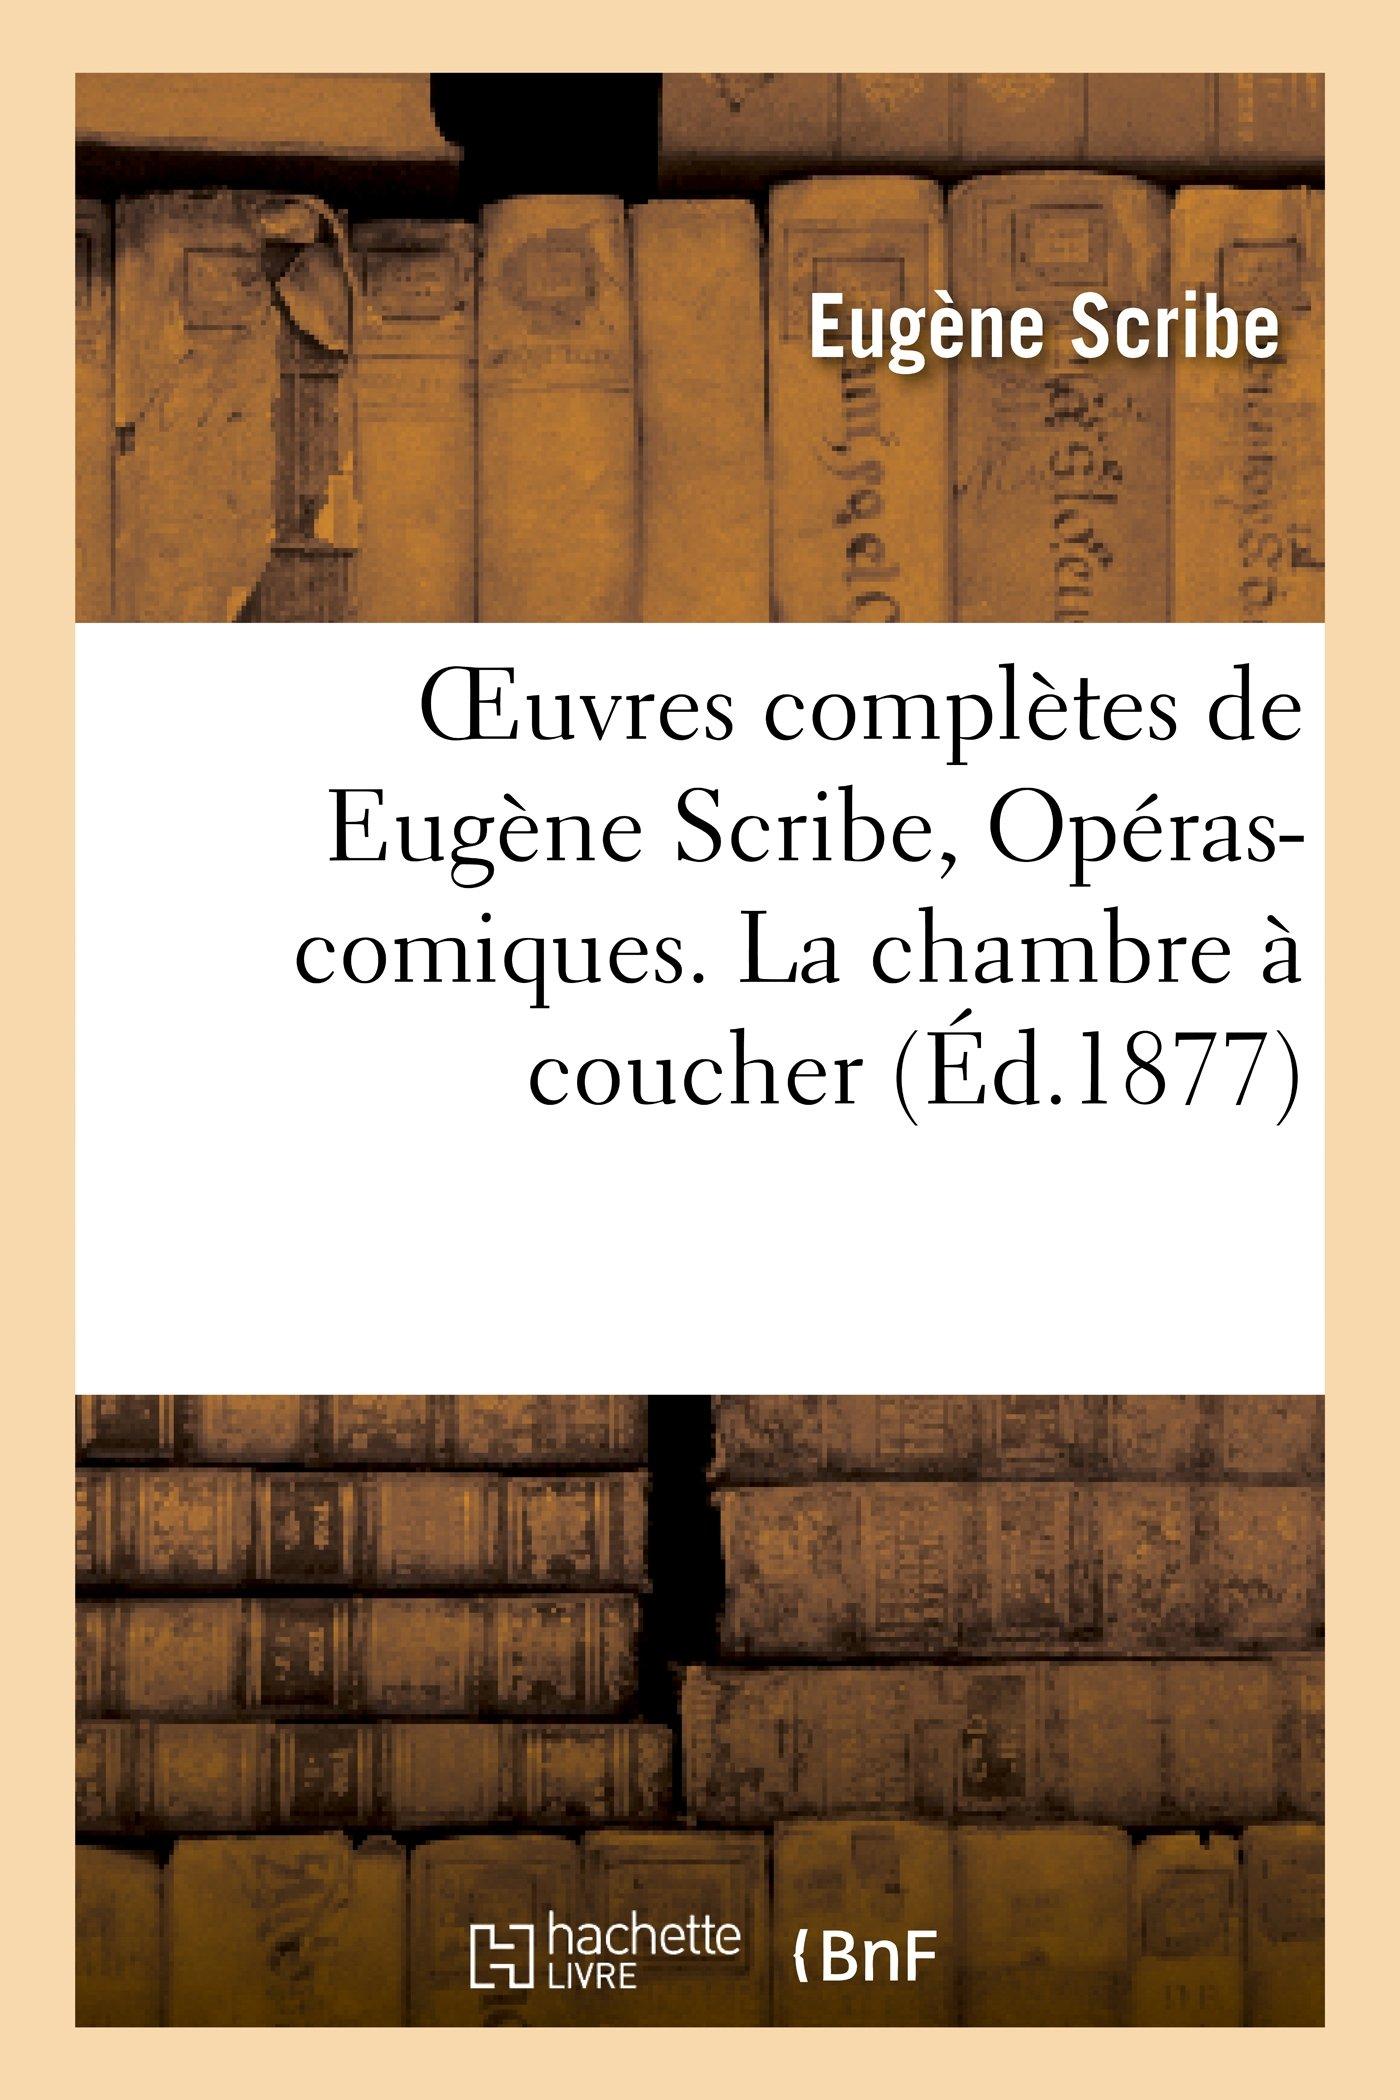 Oeuvres Completes de Eugene Scribe, Operas-Comiques. La Chambre a Coucher (Litterature) (French Edition)